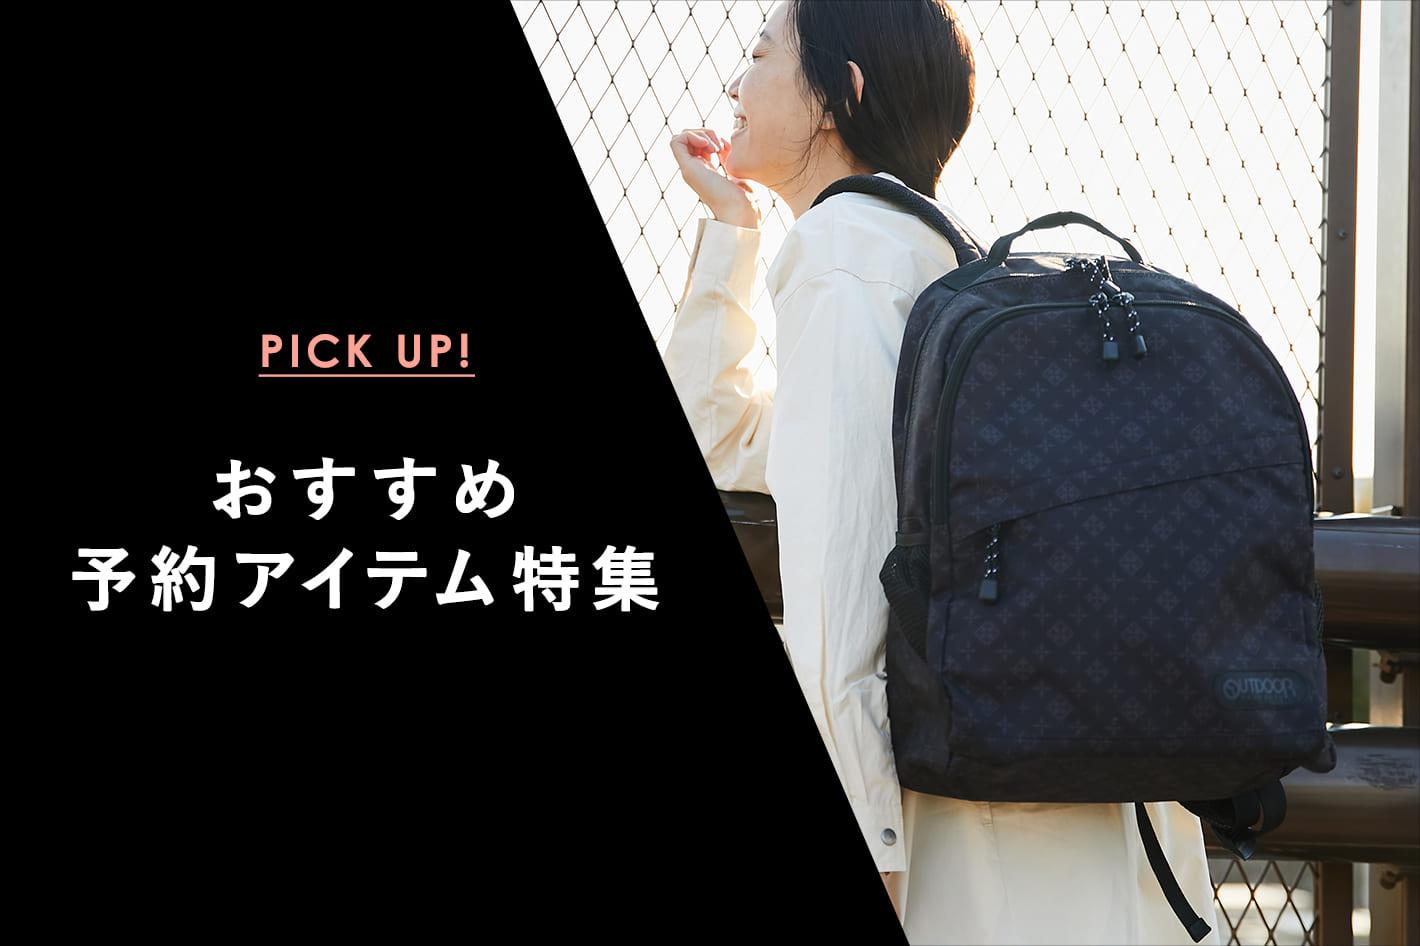 Daily russet オススメ予約アイテムピックアップ!